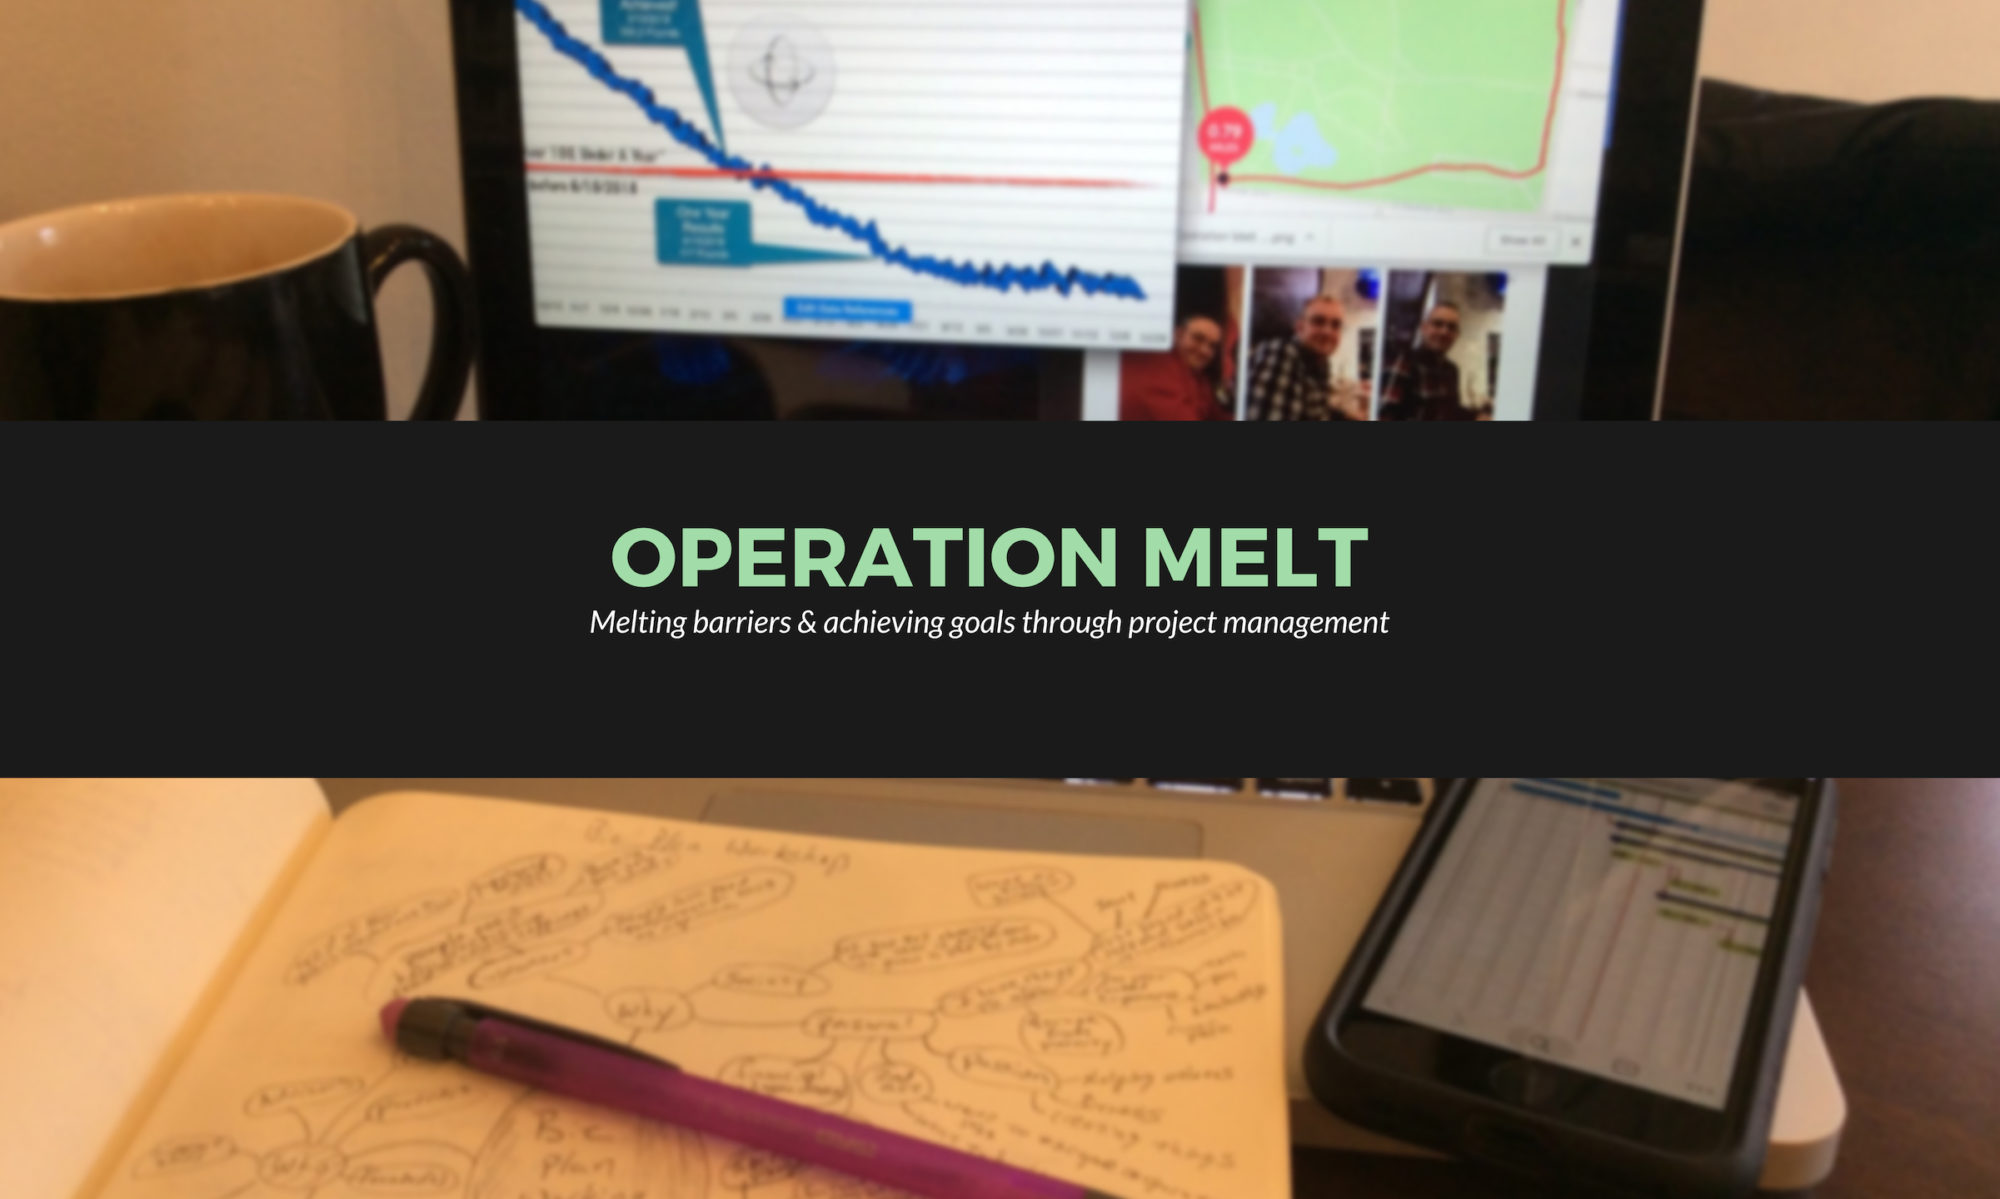 Operation Melt